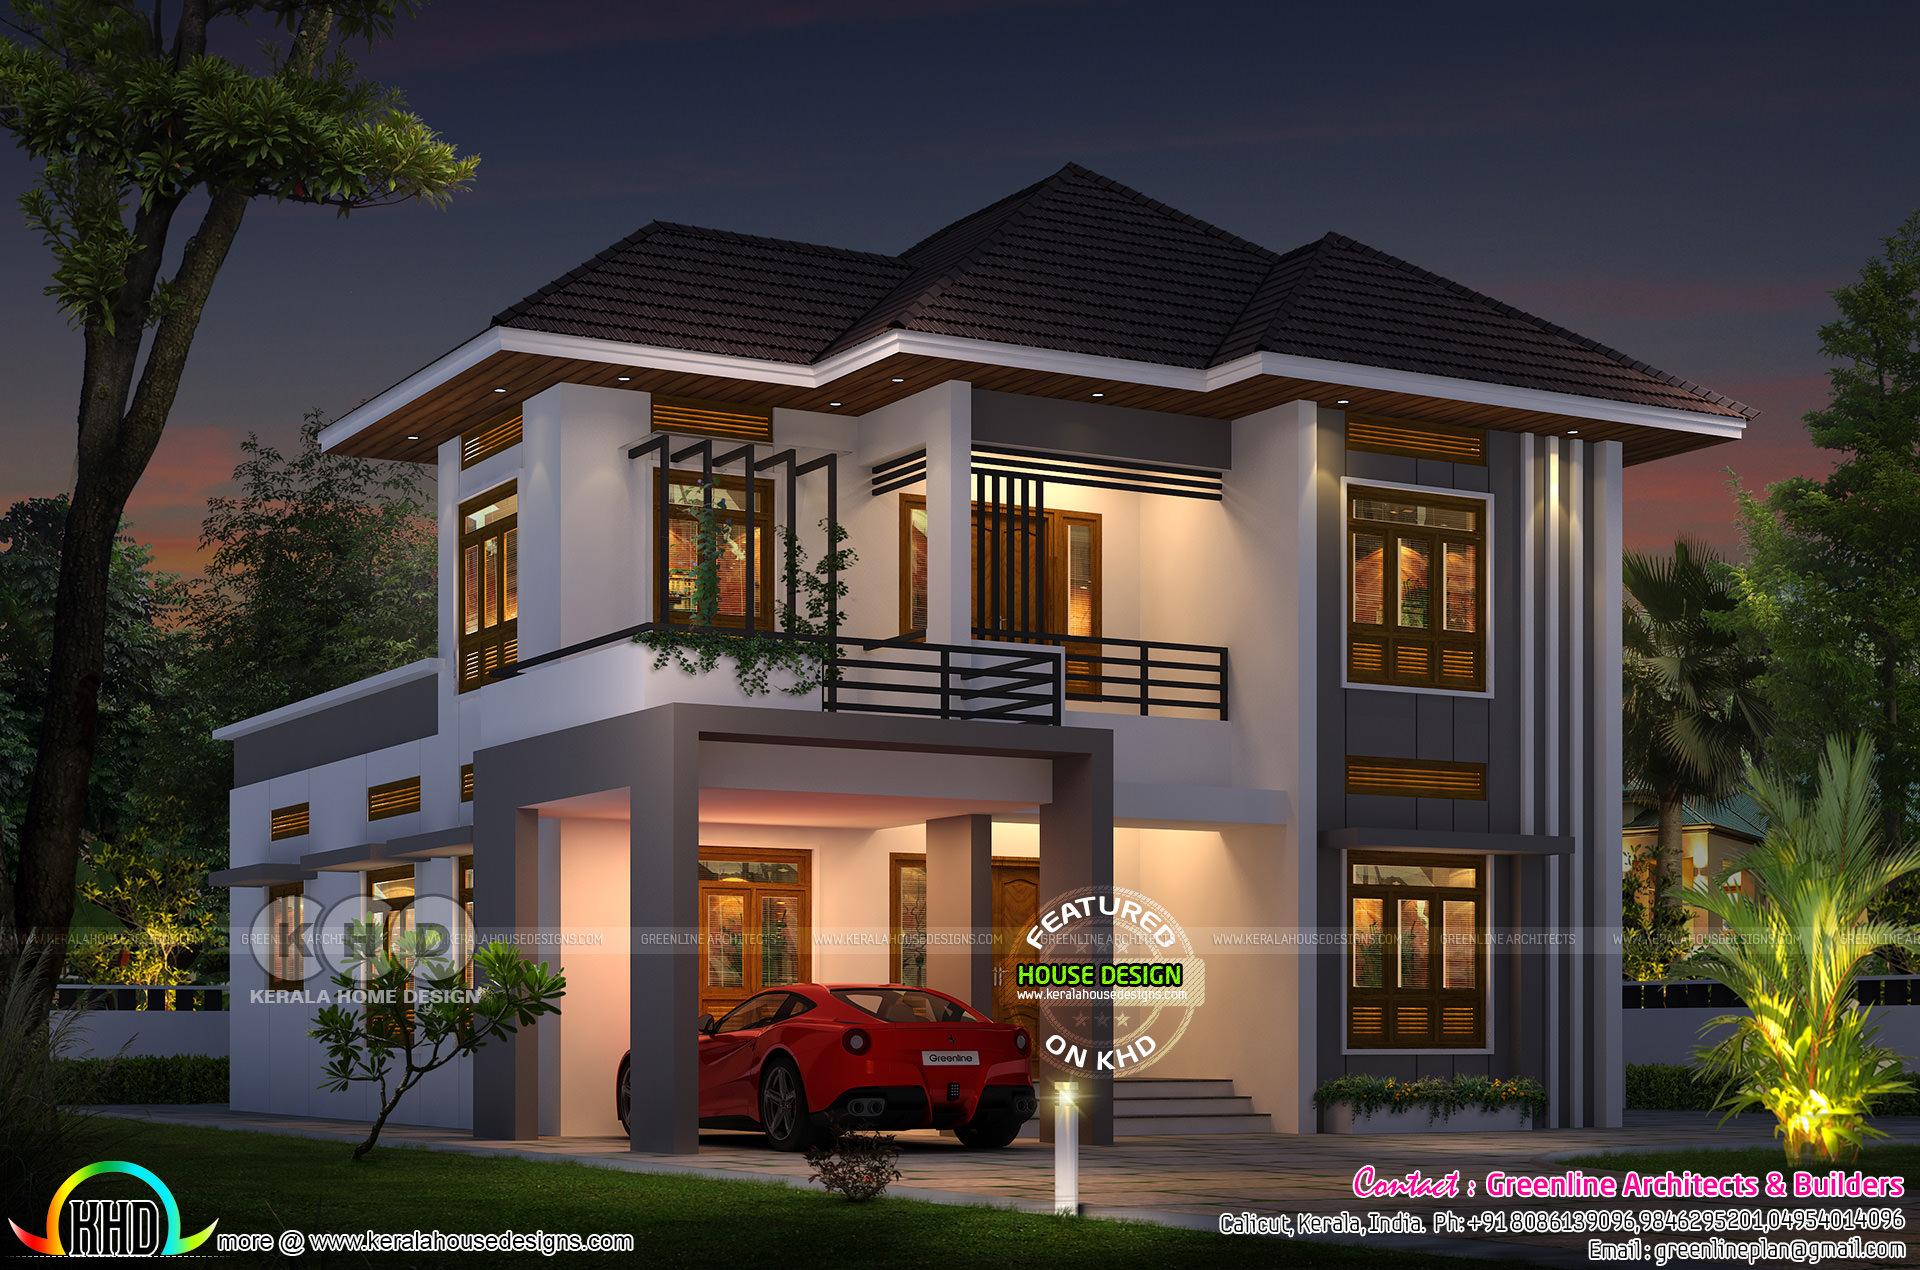 1820 Sq Ft Modern 4 Bedroom House Plan Kerala Home Design Bloglovin